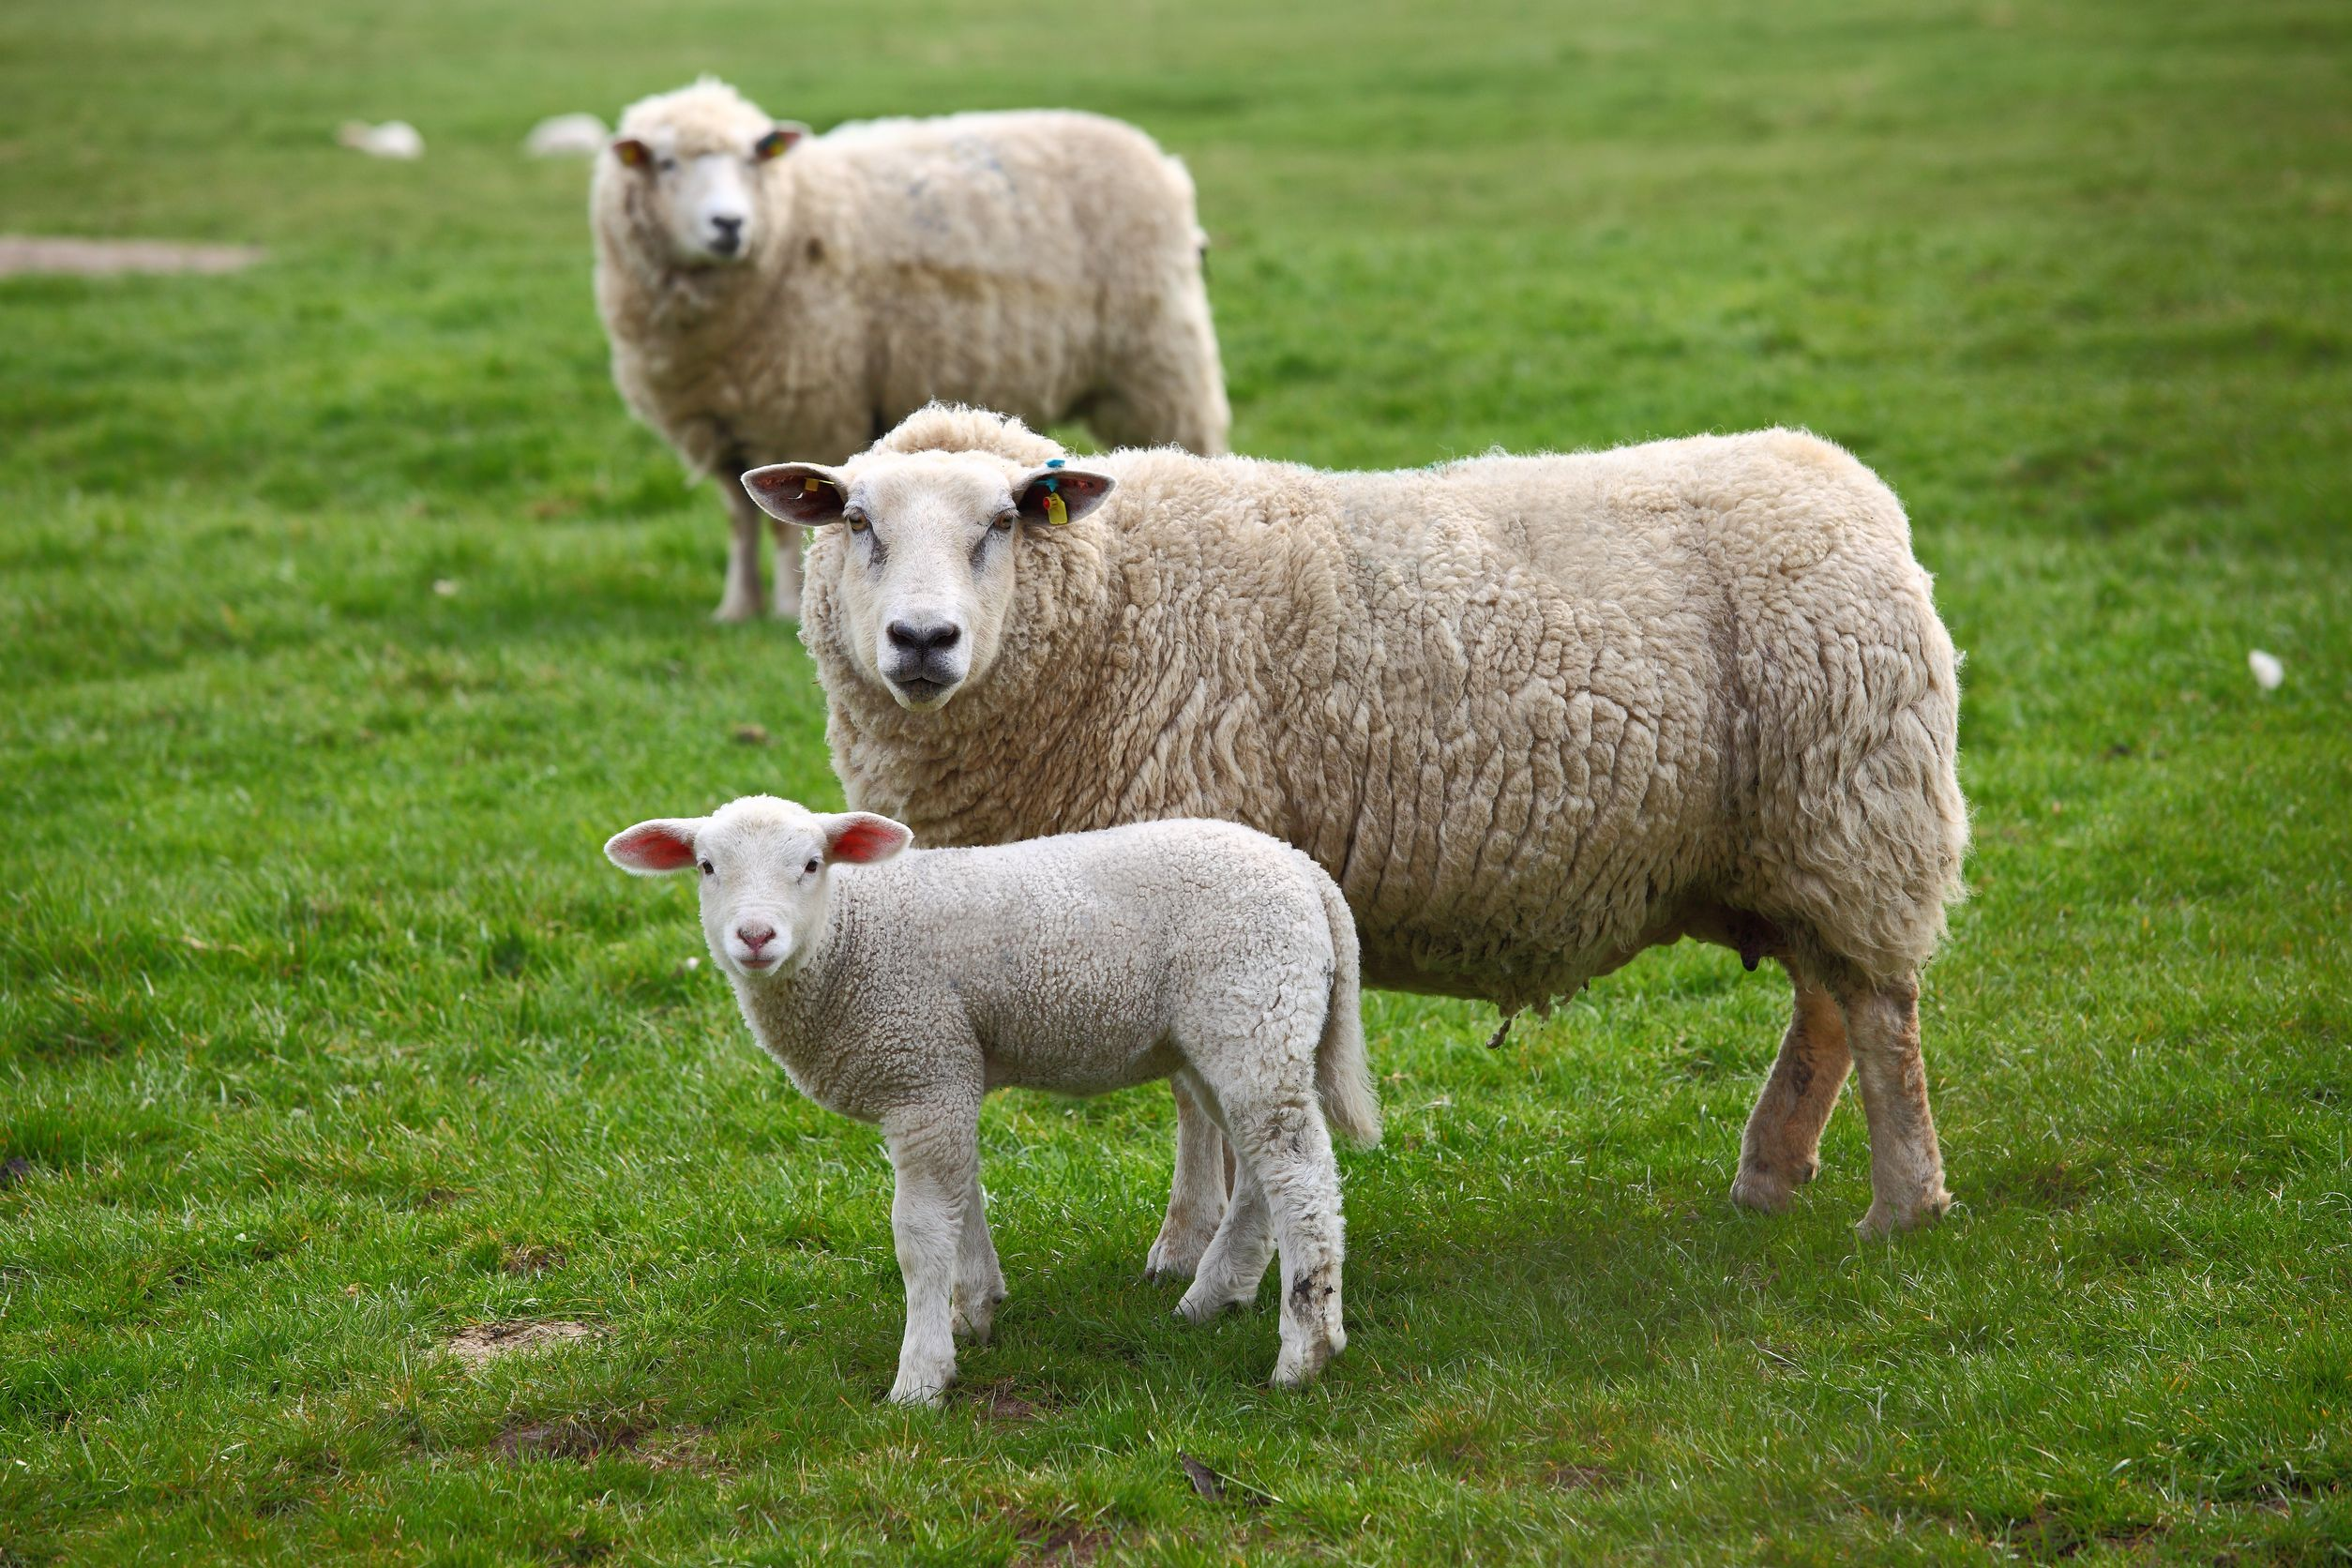 australia sheep in field 123rf